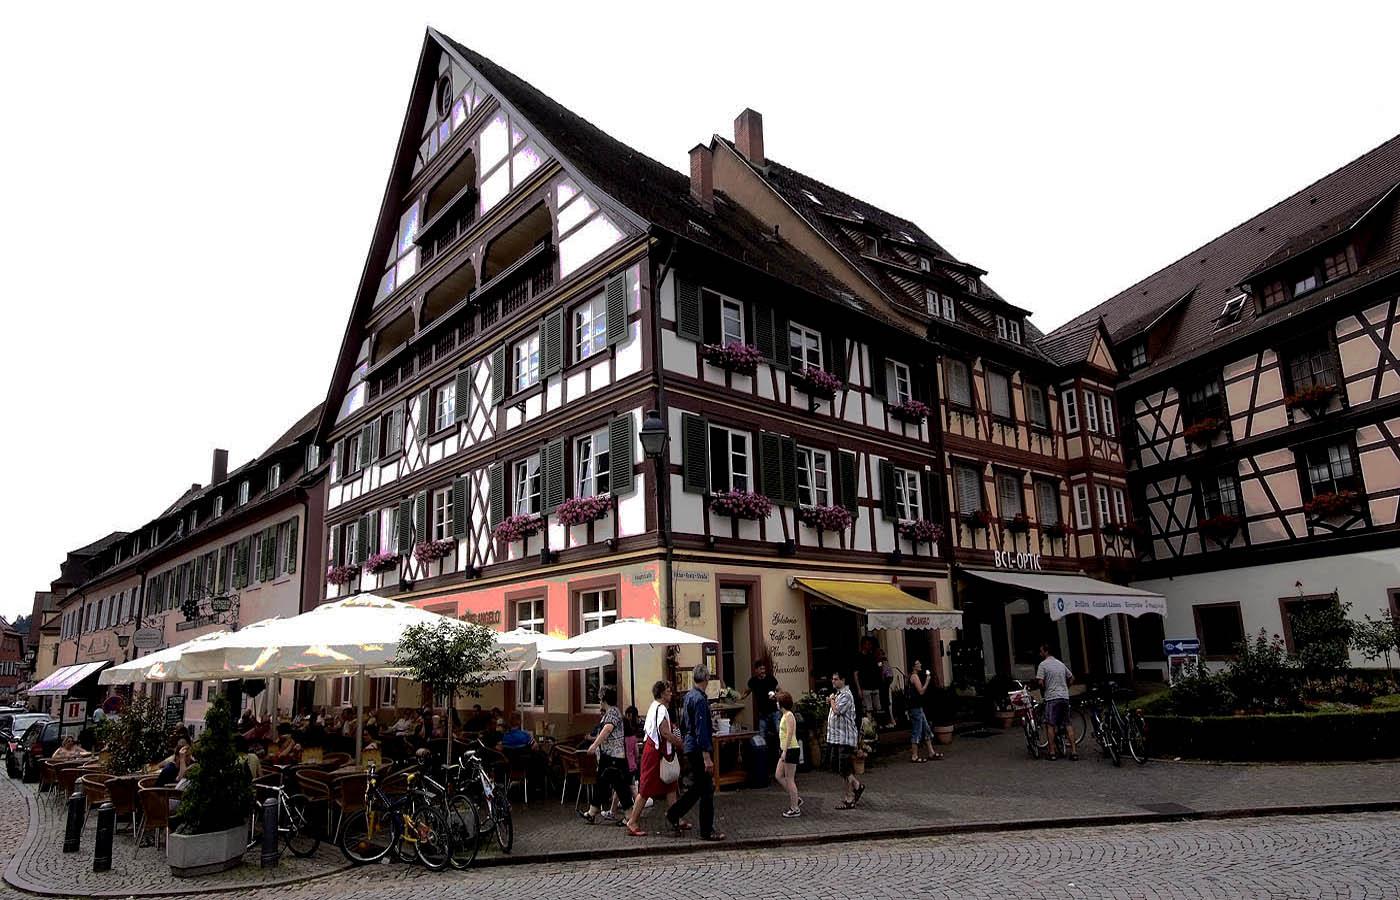 Lecker Eisessen in Gengenbach ...